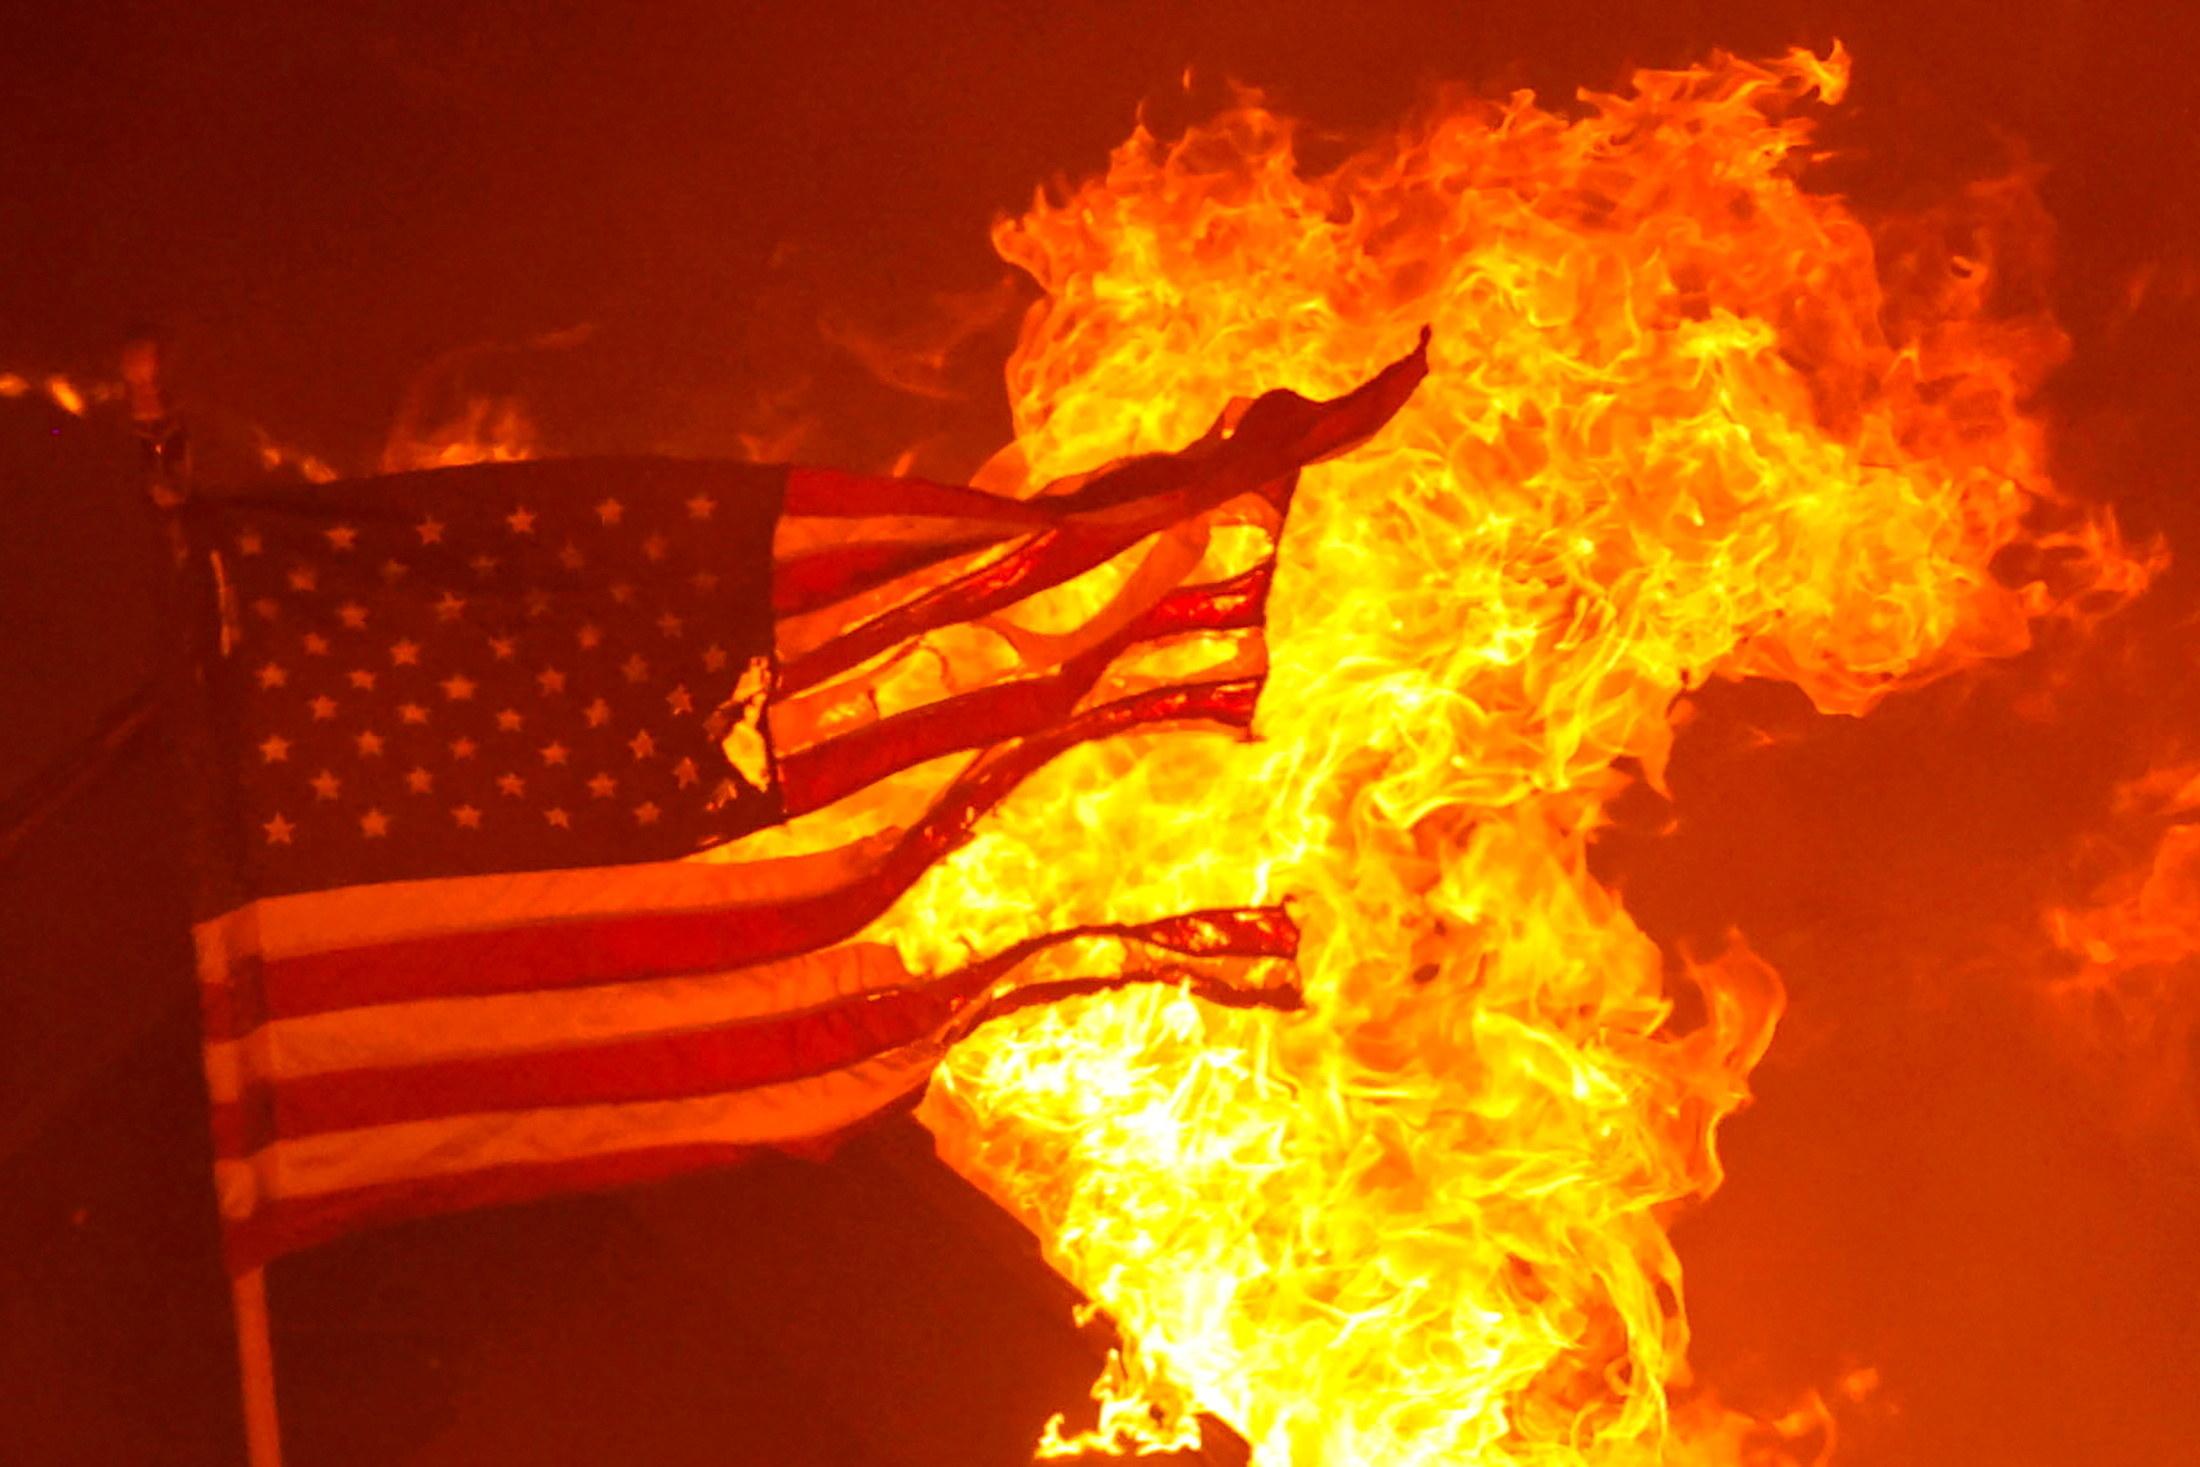 A tattered US flag burns at night